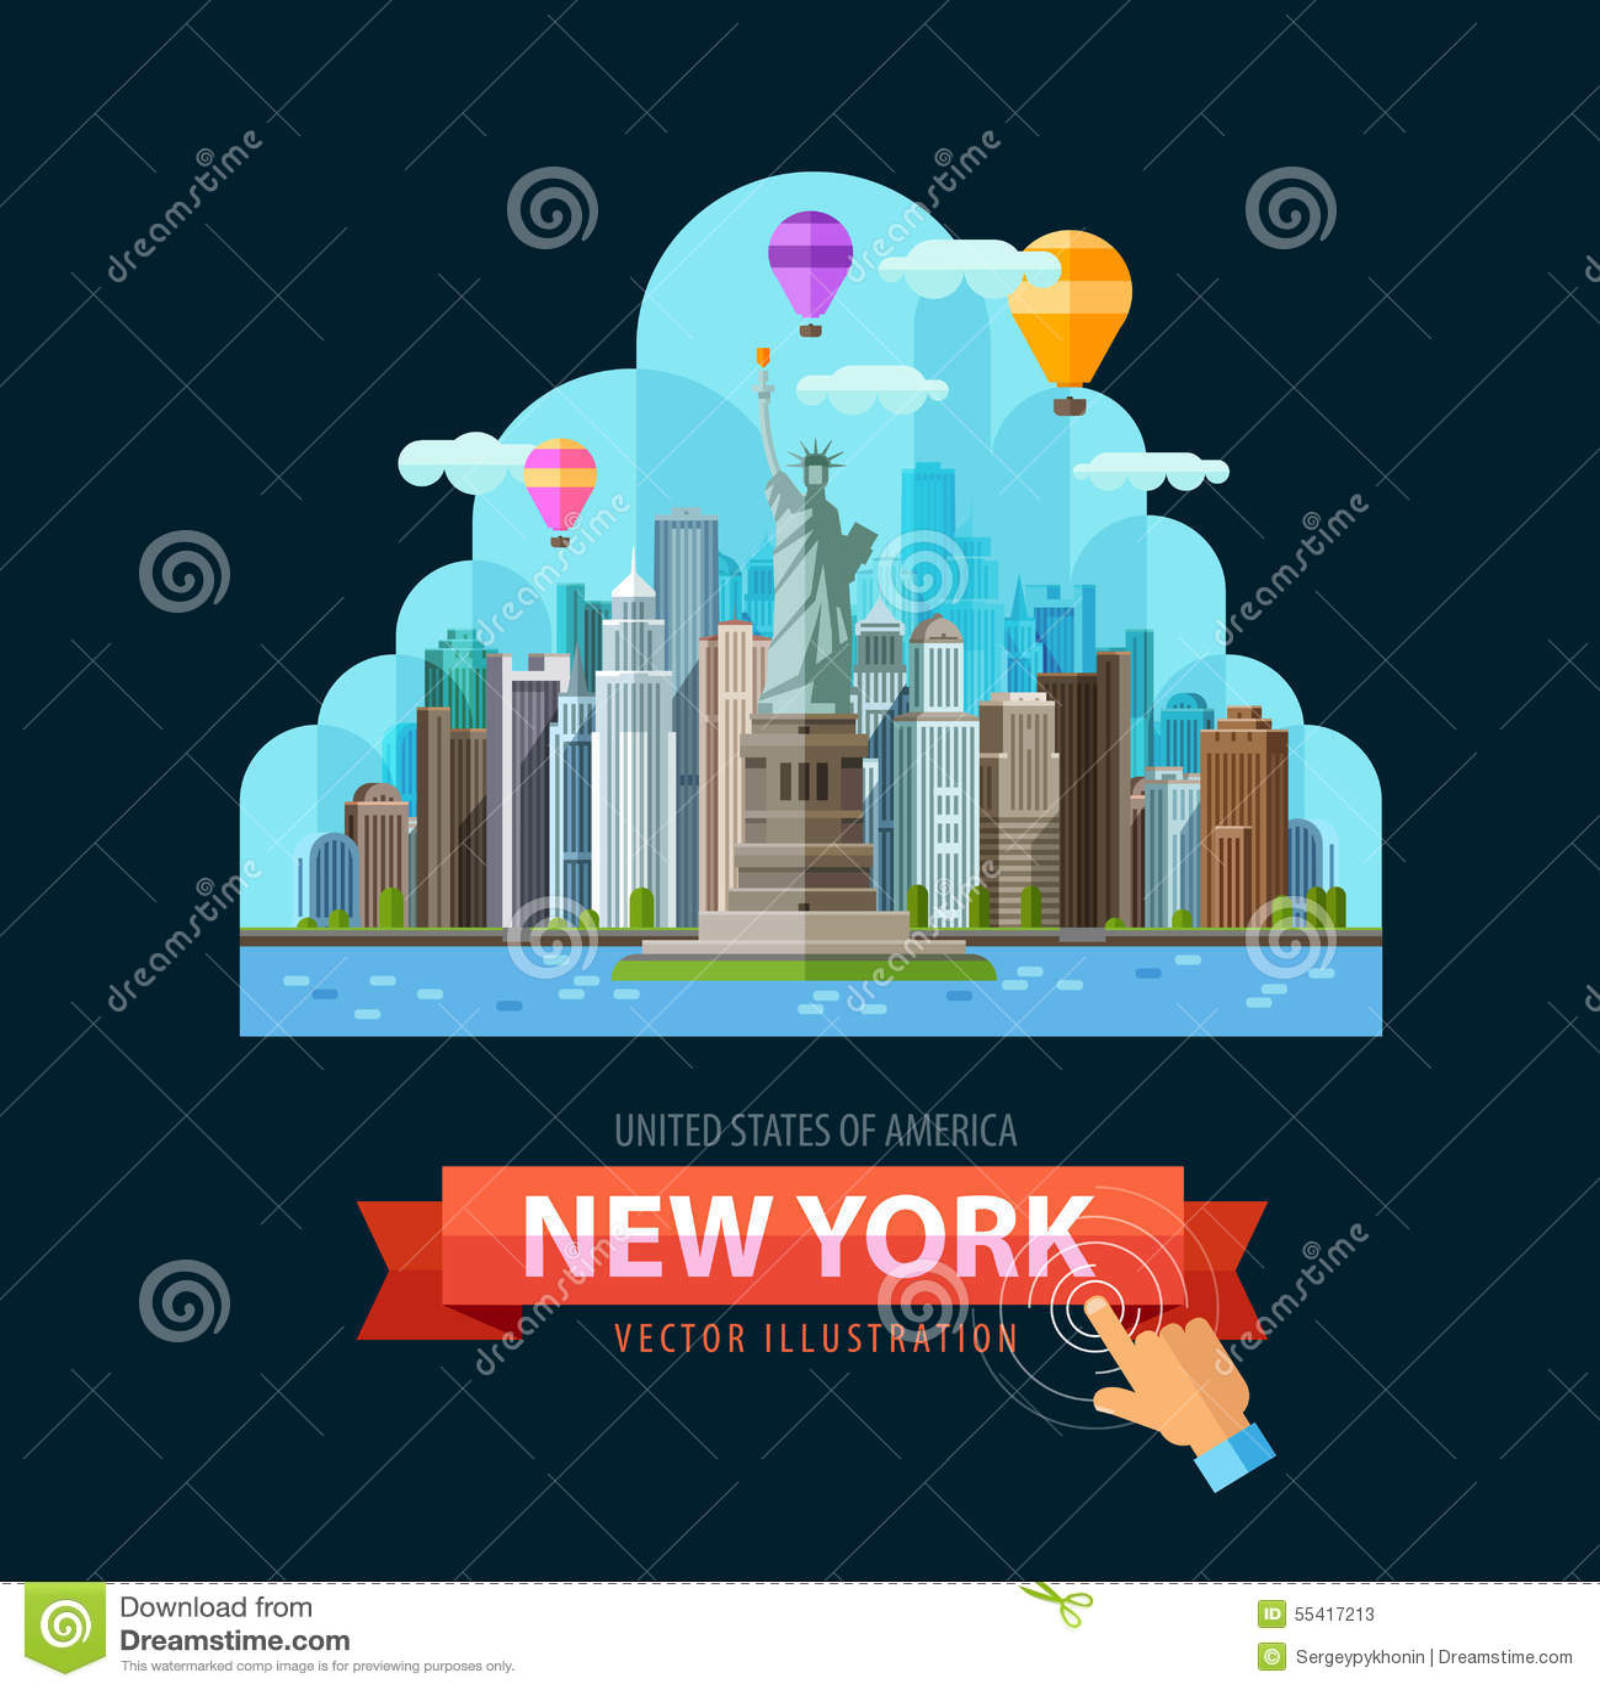 Usa Vector Logo Design Template New York City Or Illustration 55417213 Megapixl